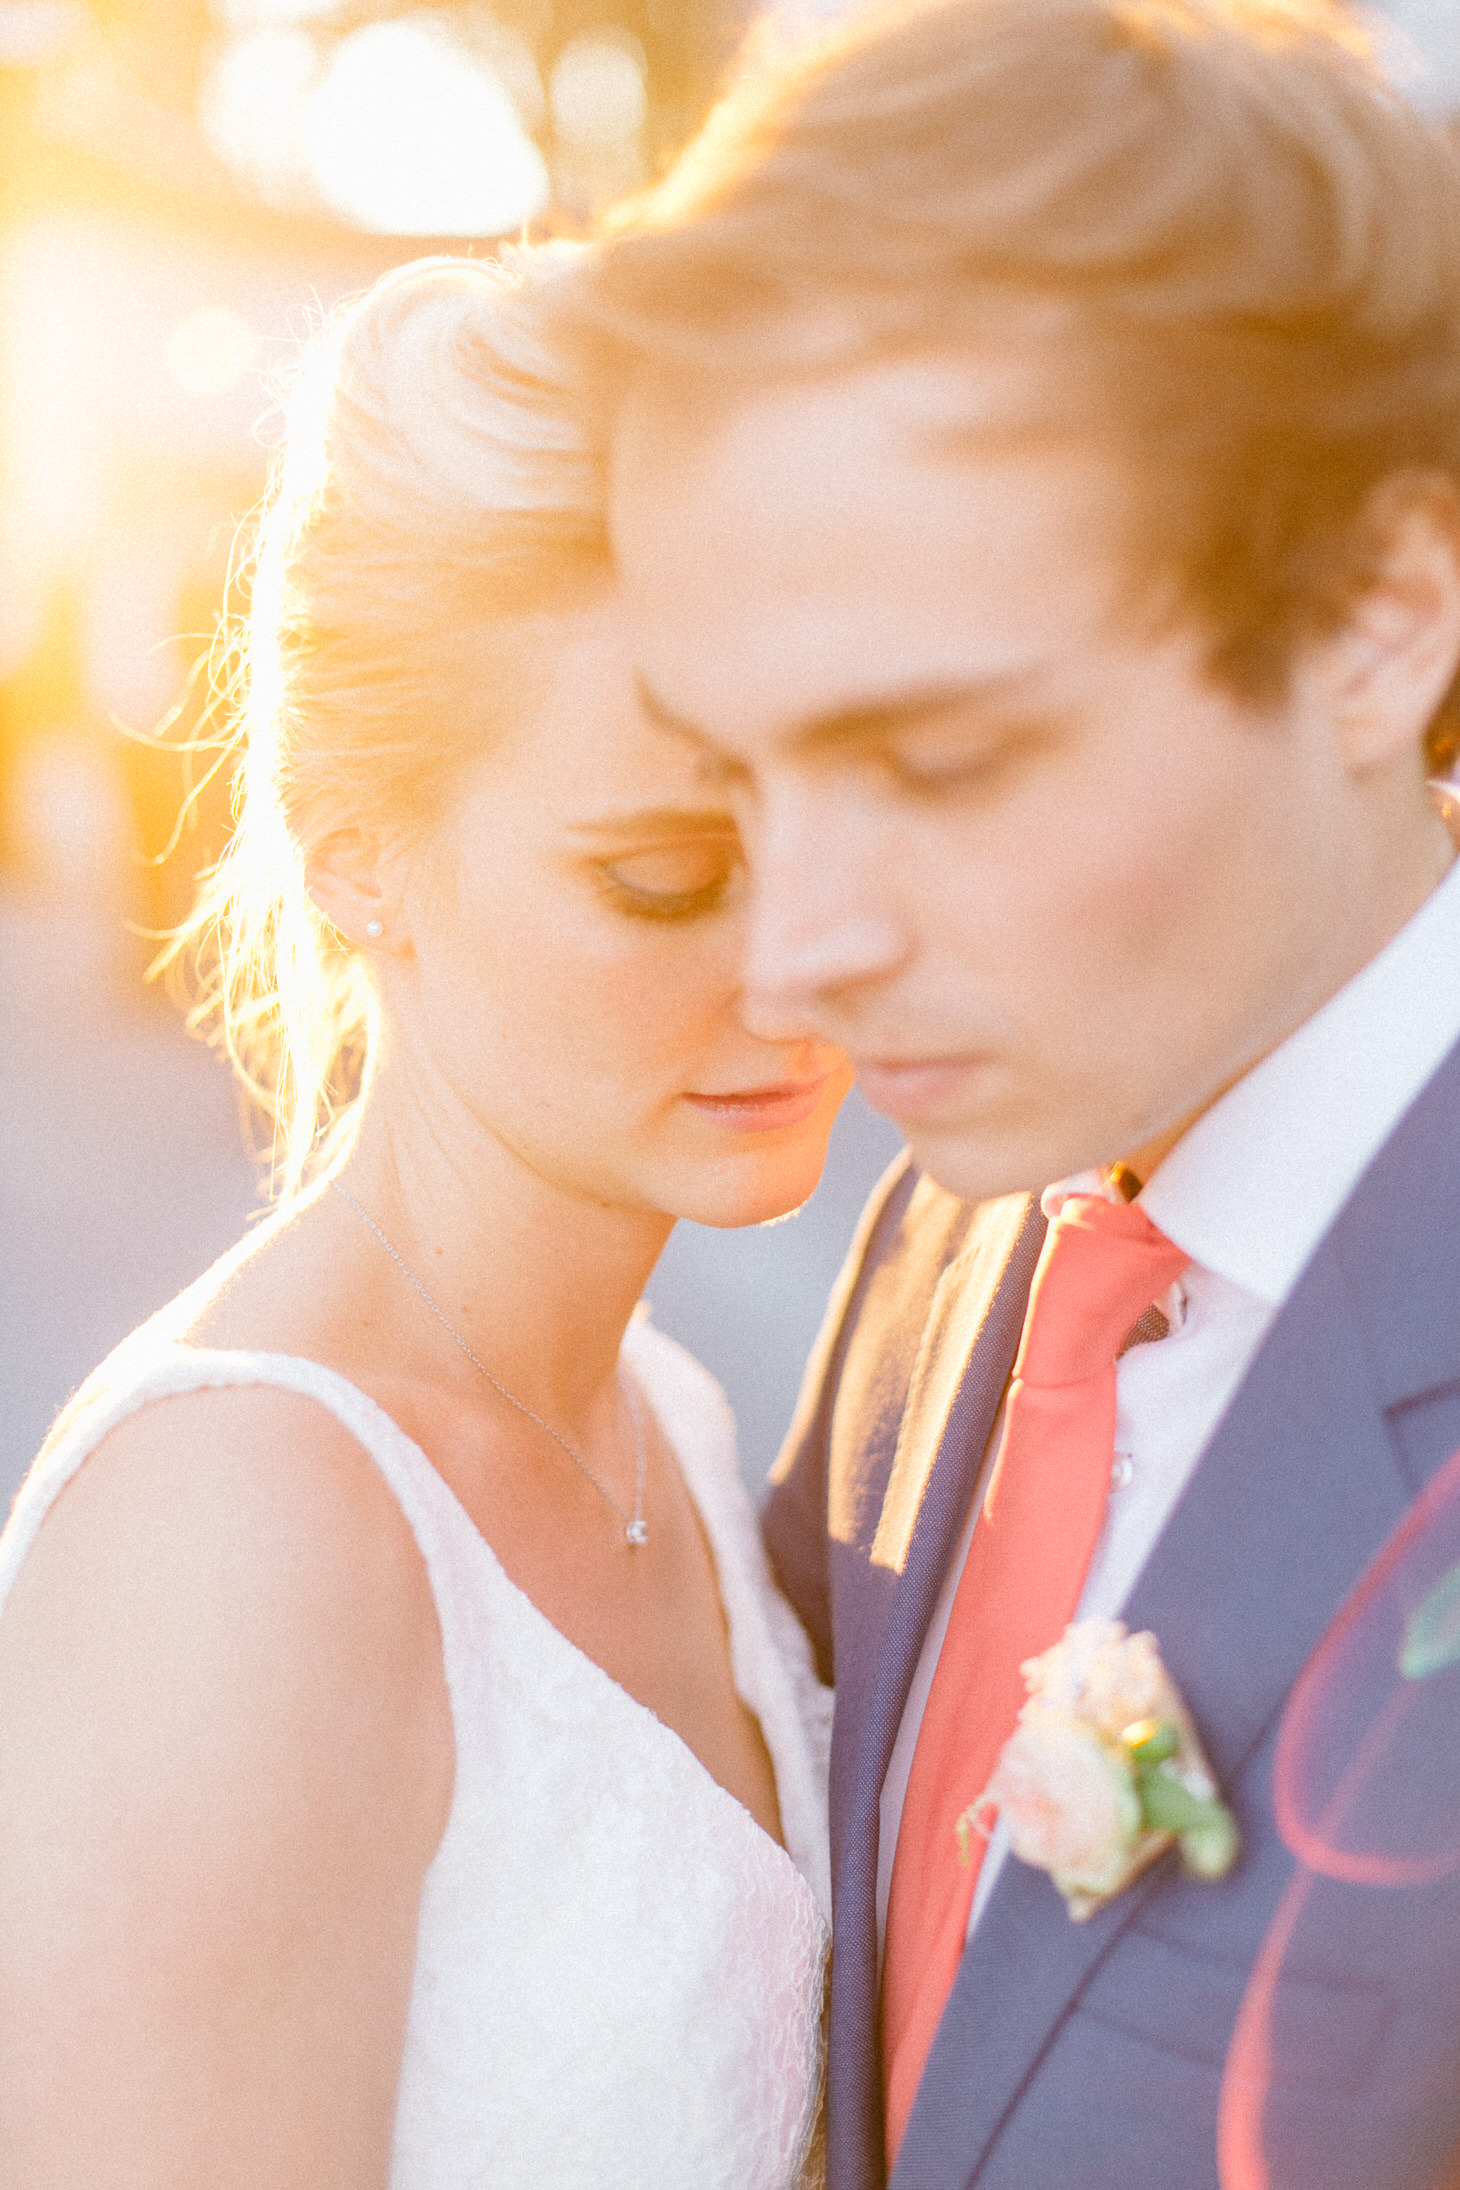 photographe-mariage-paris-montfort-l-amaury-086